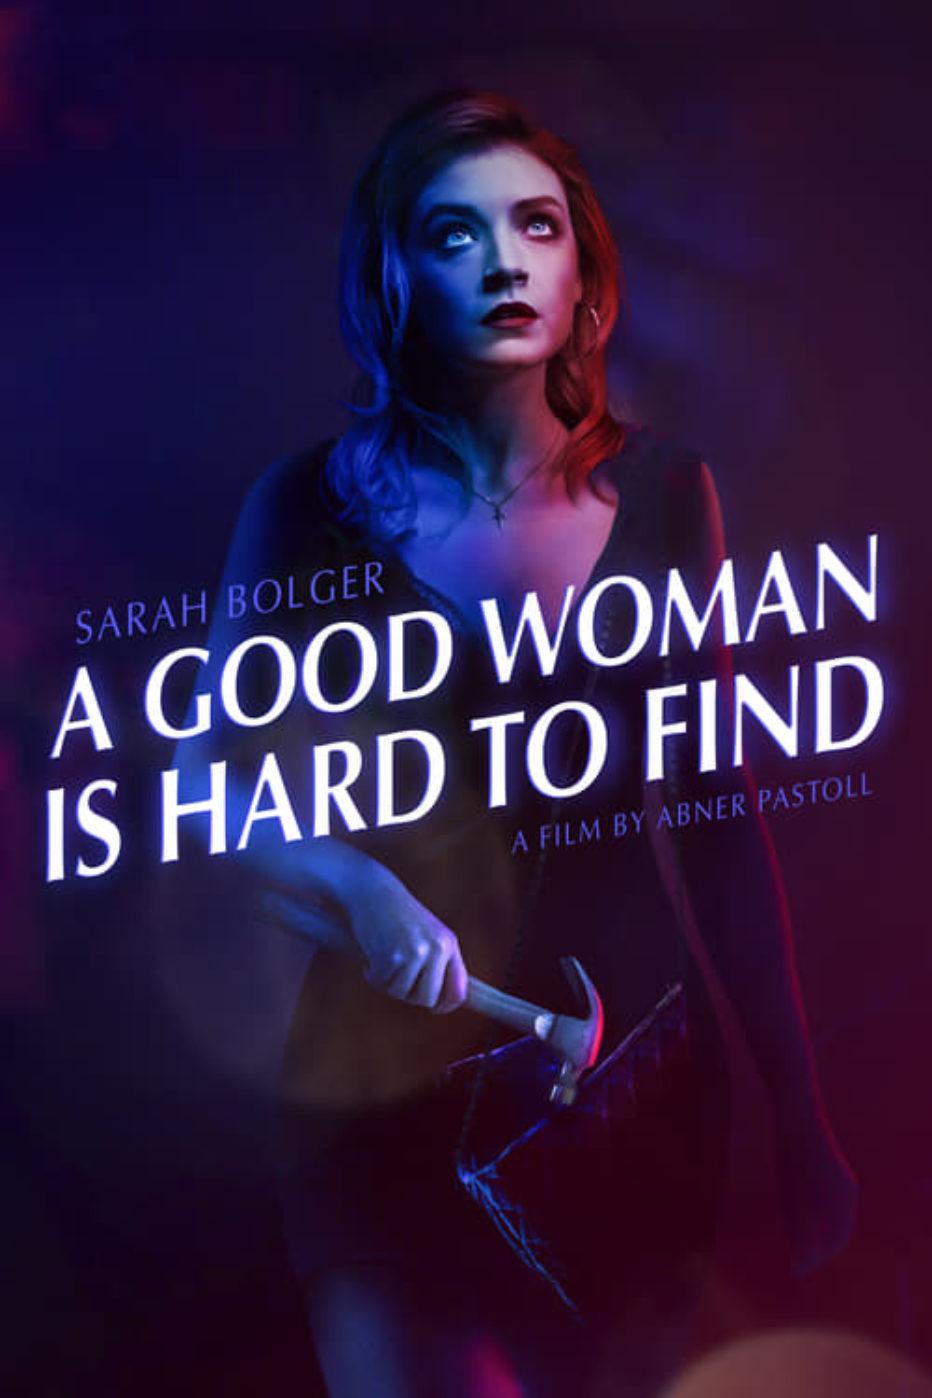 A Good Woman is Hard to Find: saliendo del pozo a la fuerza